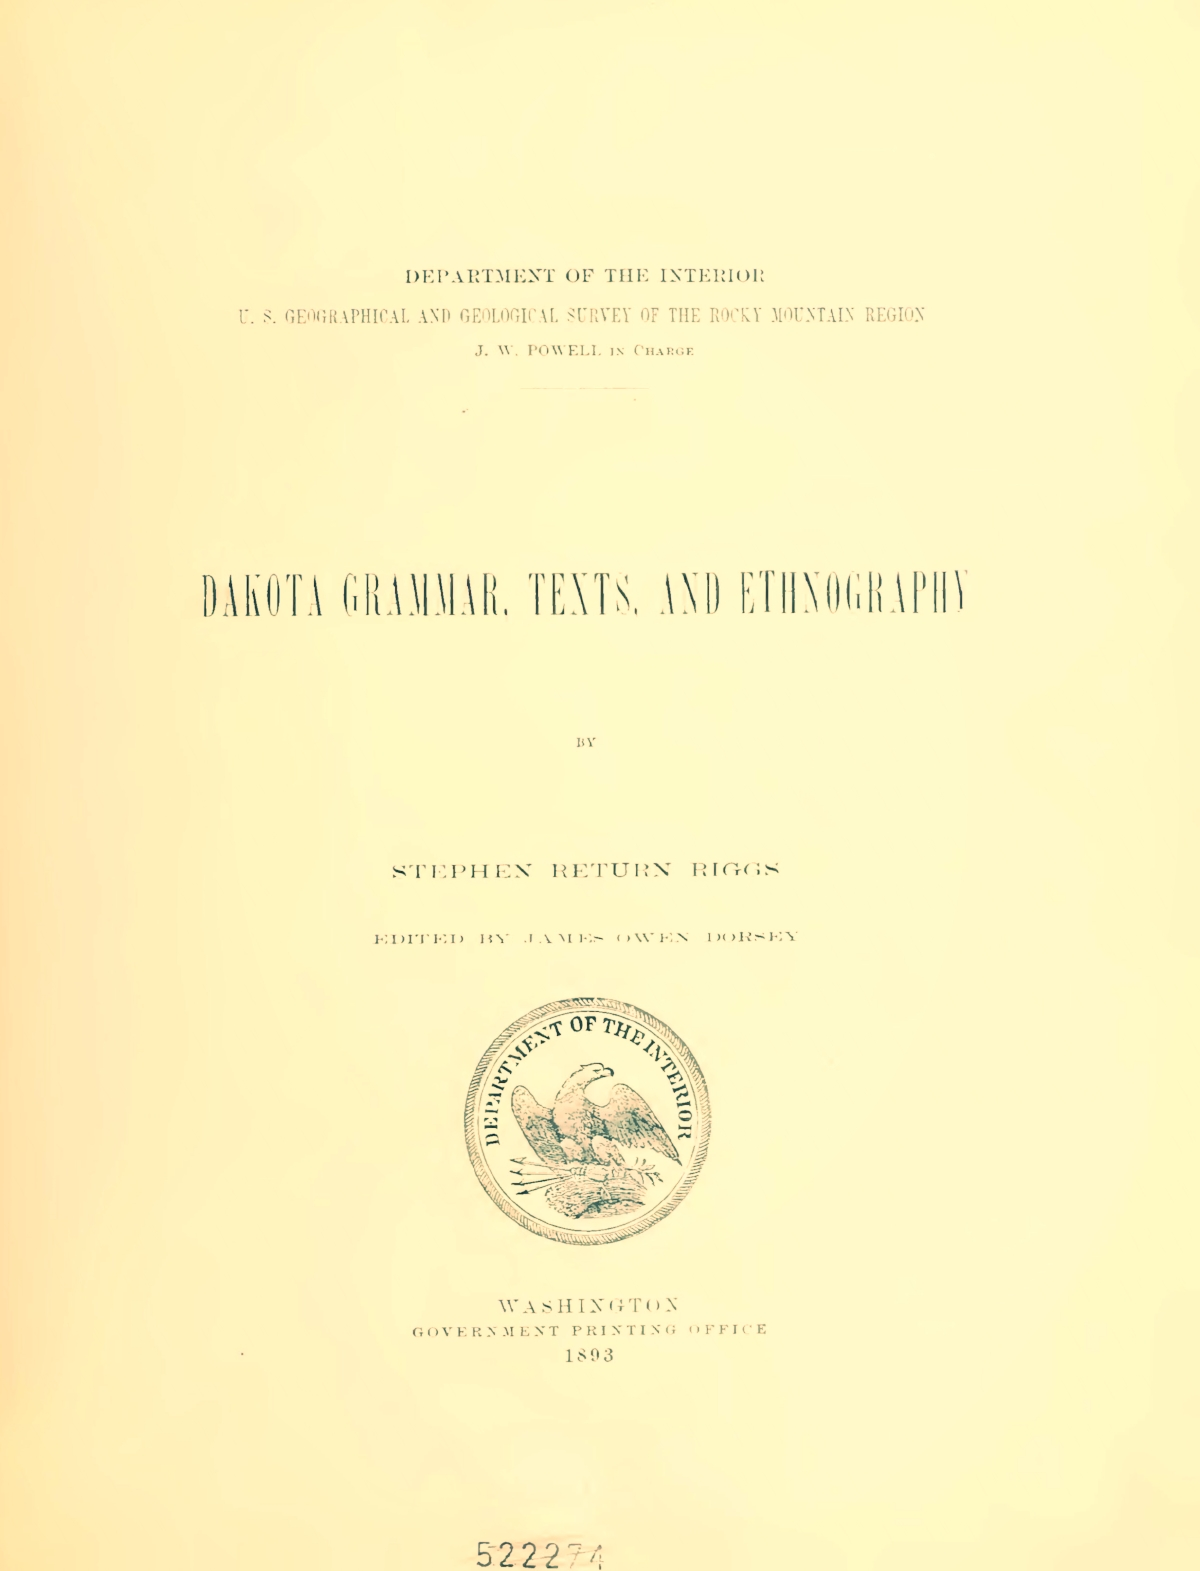 Riggs, Stephen Return, Dakota Grammar, Texts, and Ethnography Title Page.jpg